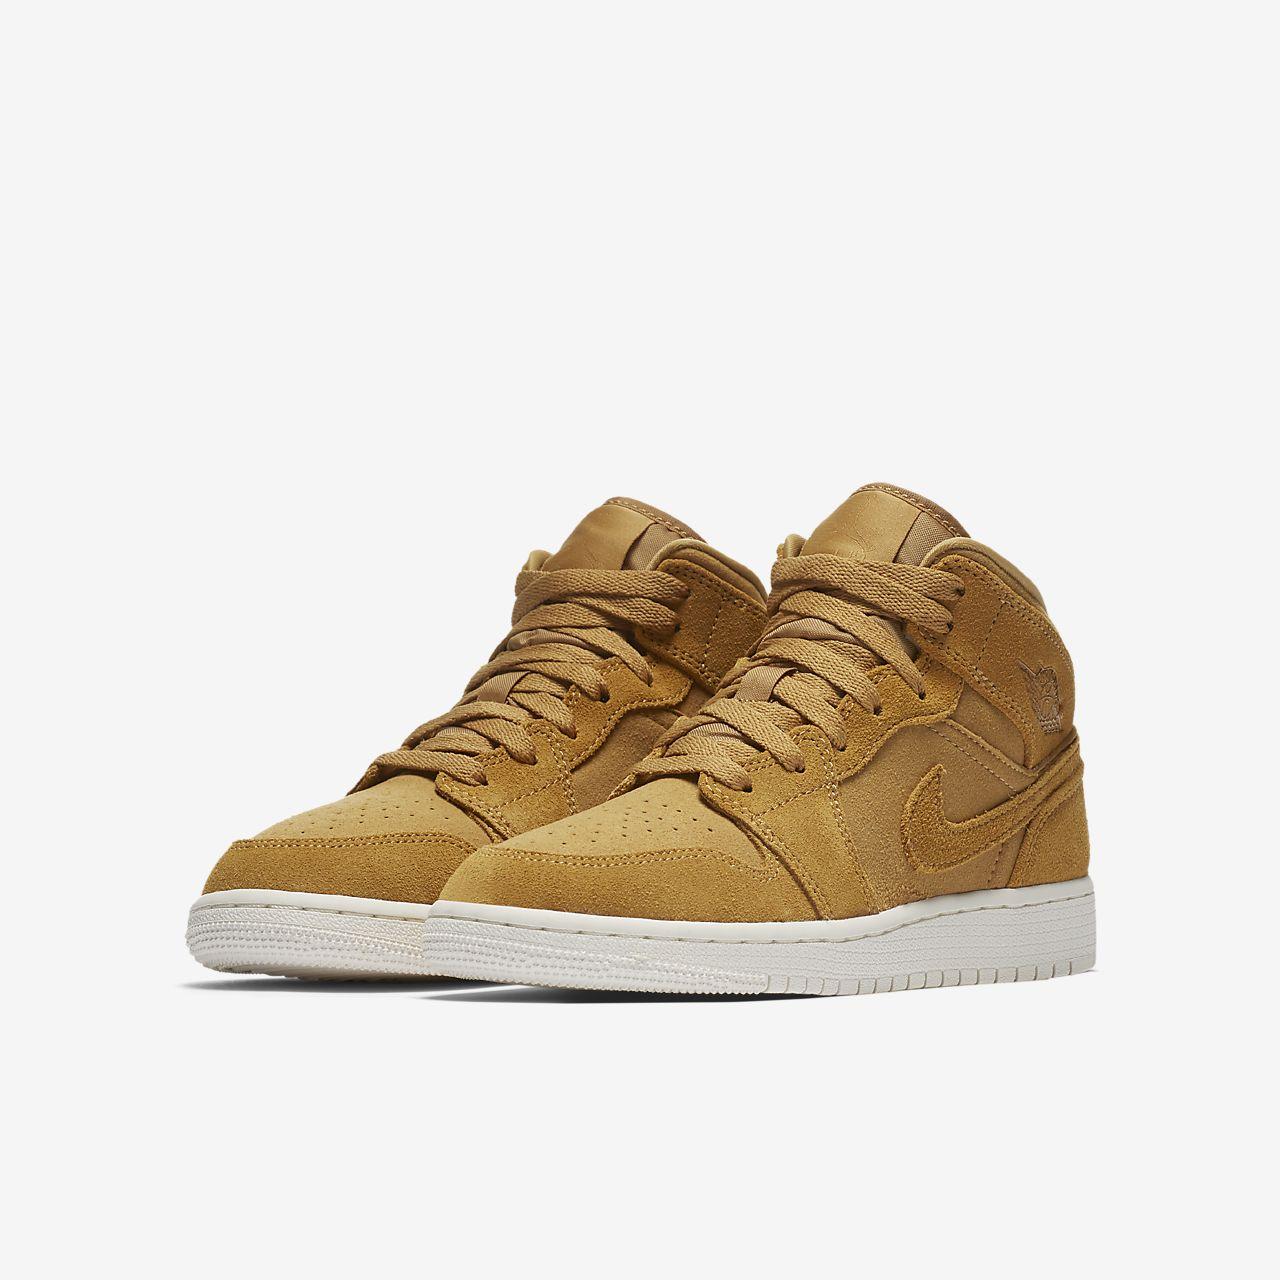 free shipping 6f517 754d6 jordan xii original boy s shoes